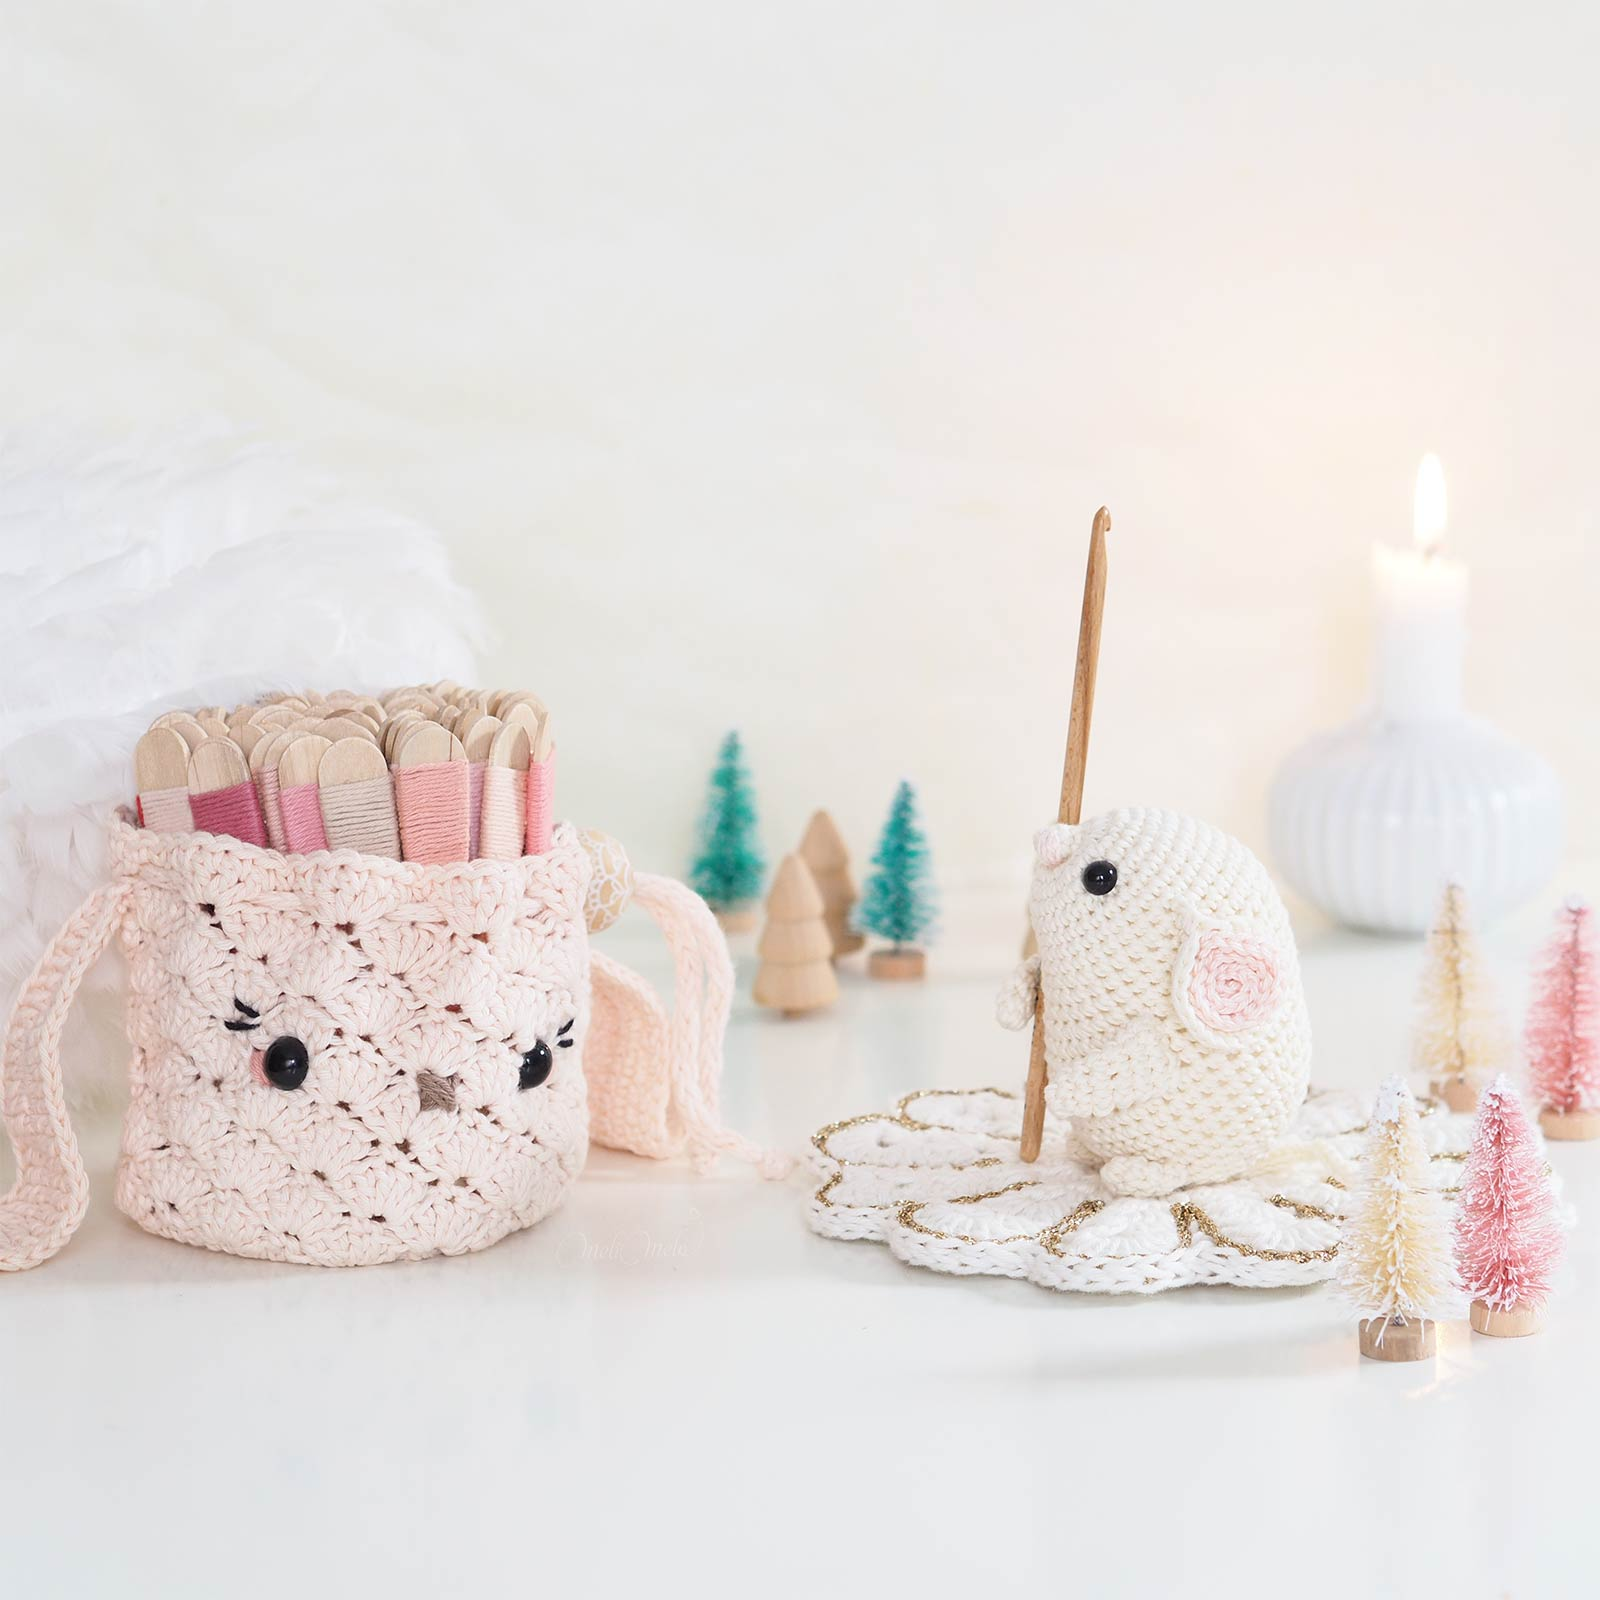 bag-pochon-lapin-souris-crochet-coton-ricorumi-amigurumi-laboutiquedemelimelo